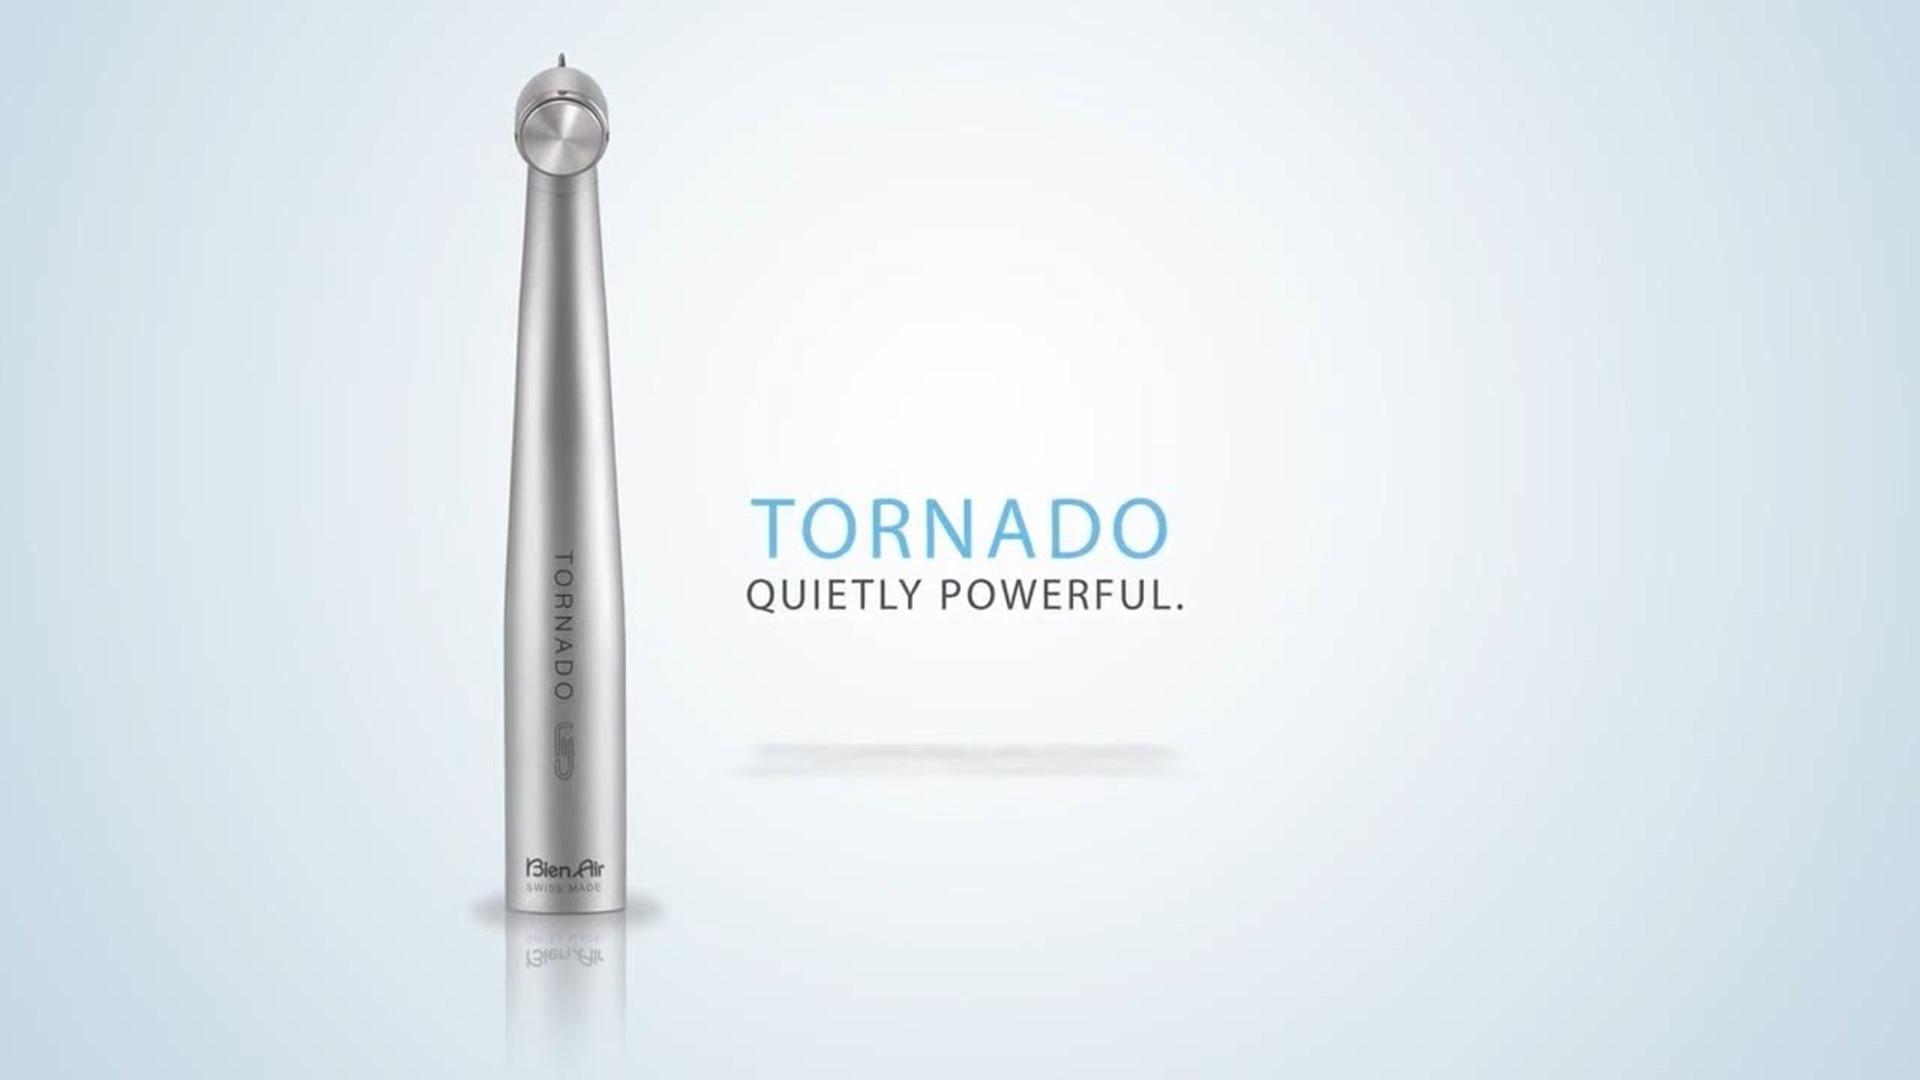 Bien Air Tornado High Speed Dental Handpiece